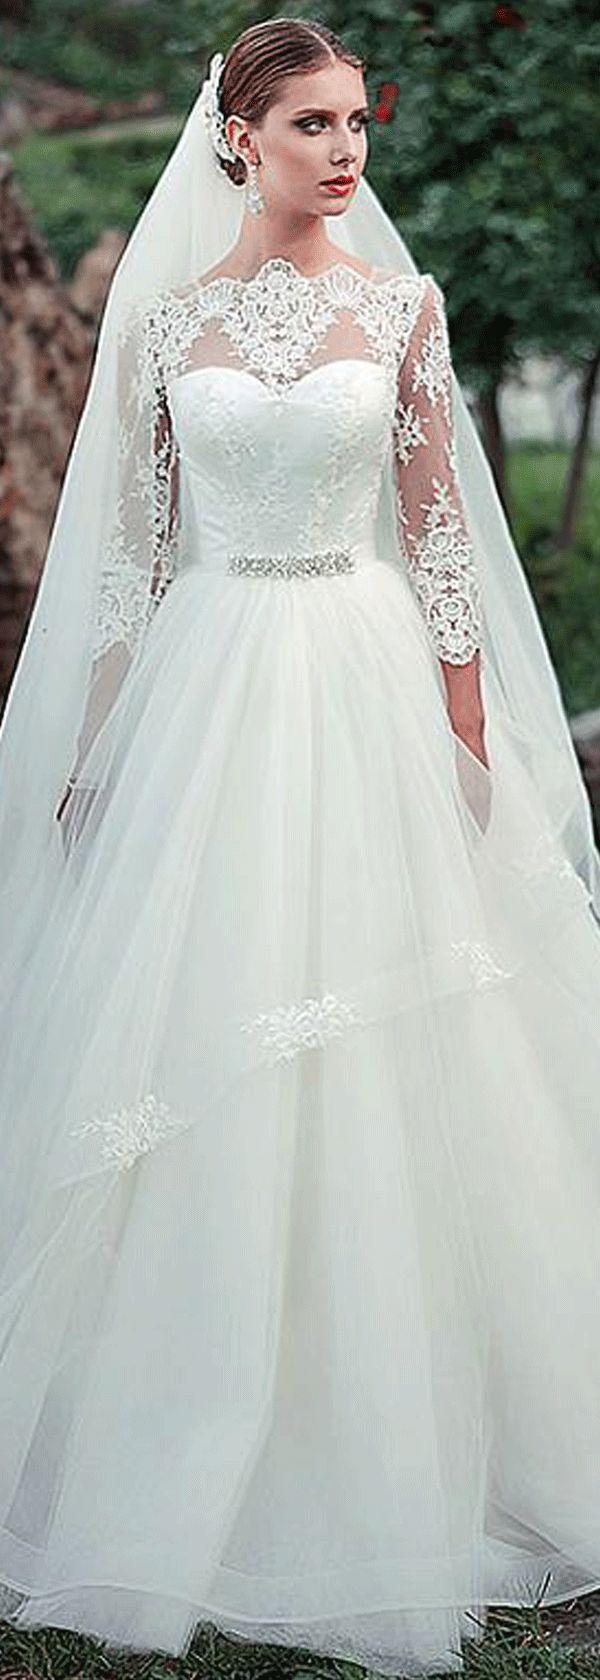 Fabulous Tulle Bateau Neckline A-line Wedding Dresses With Beadings…